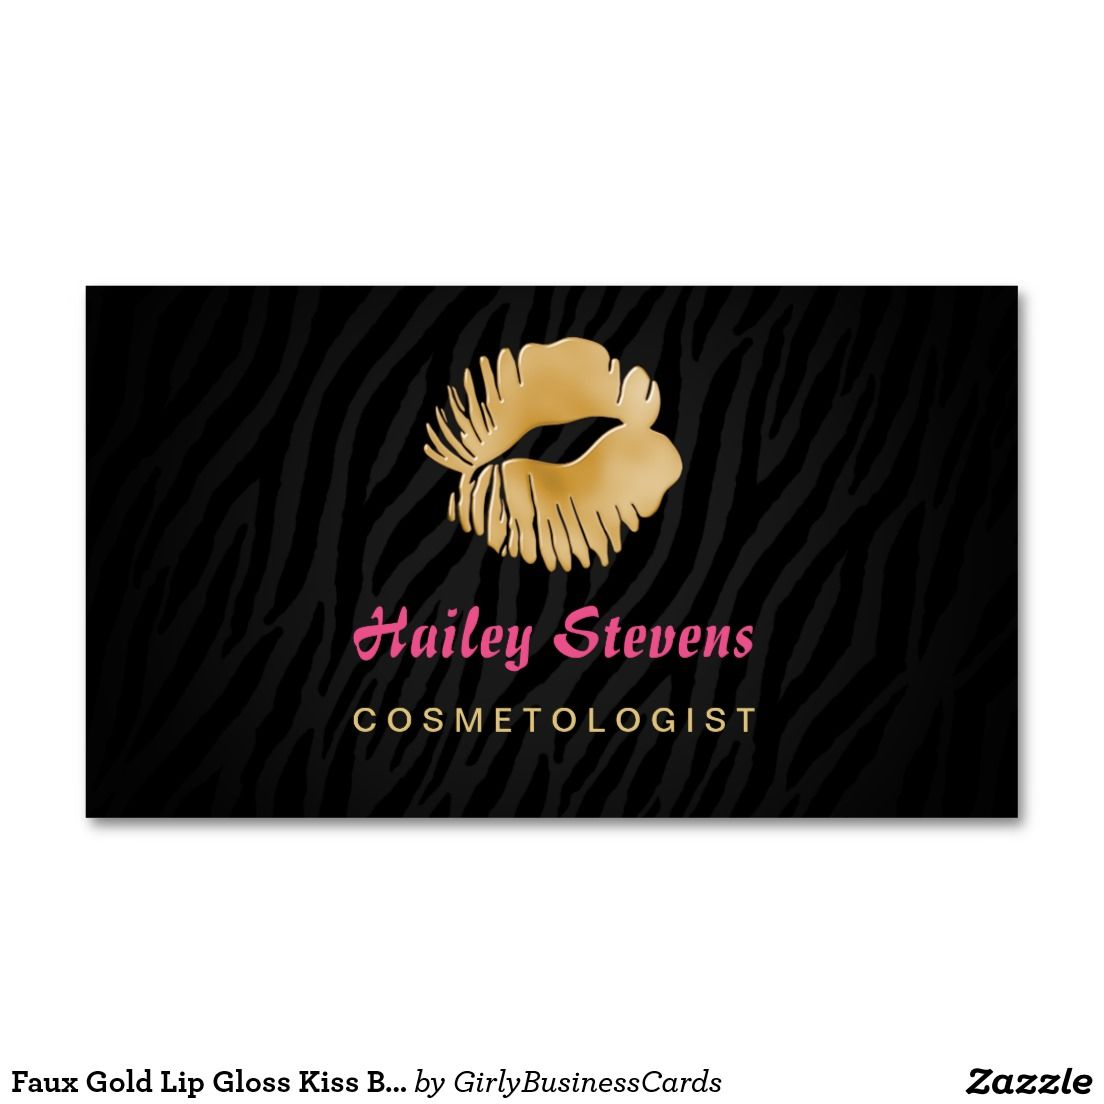 Faux gold lip gloss kiss black zebra cosmetologist